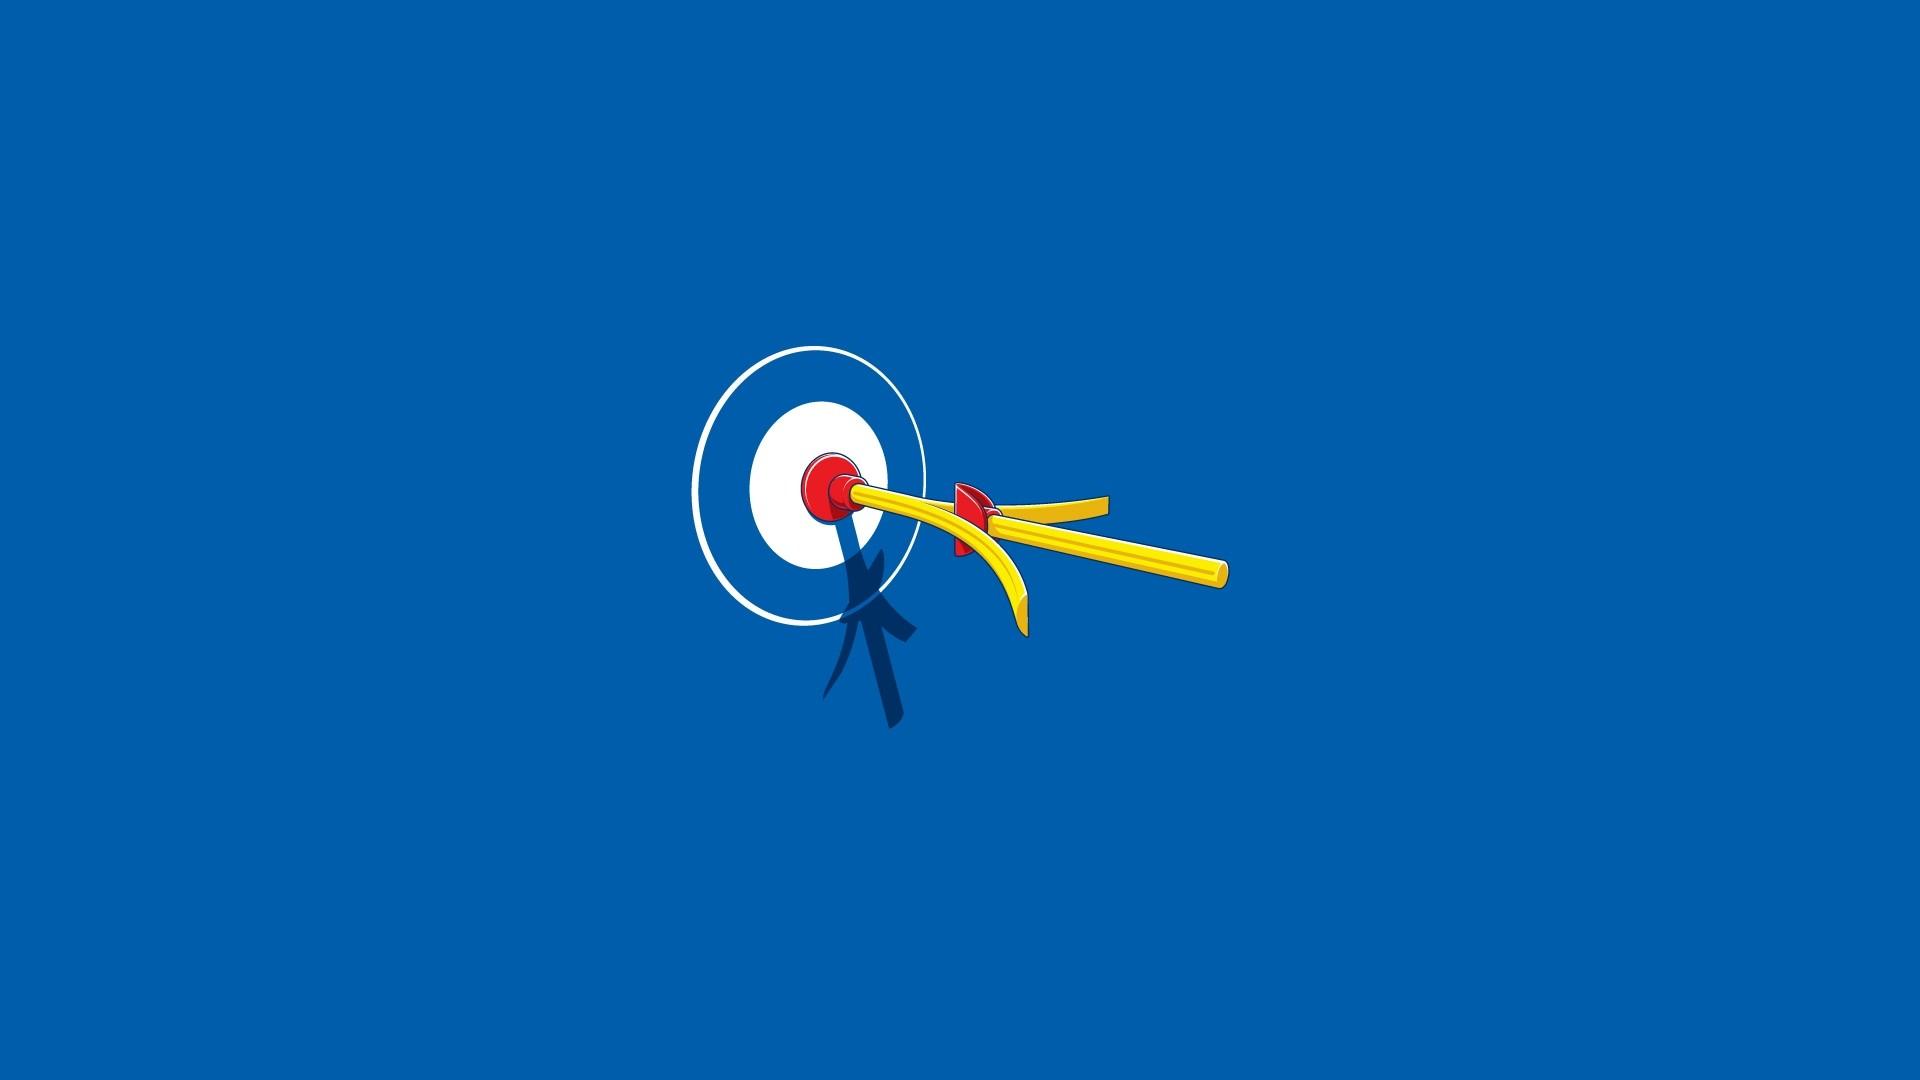 Res: 1920x1080, CGI archery | Archery art | Pinterest | Artemis, Hd desktop and Wallpaper